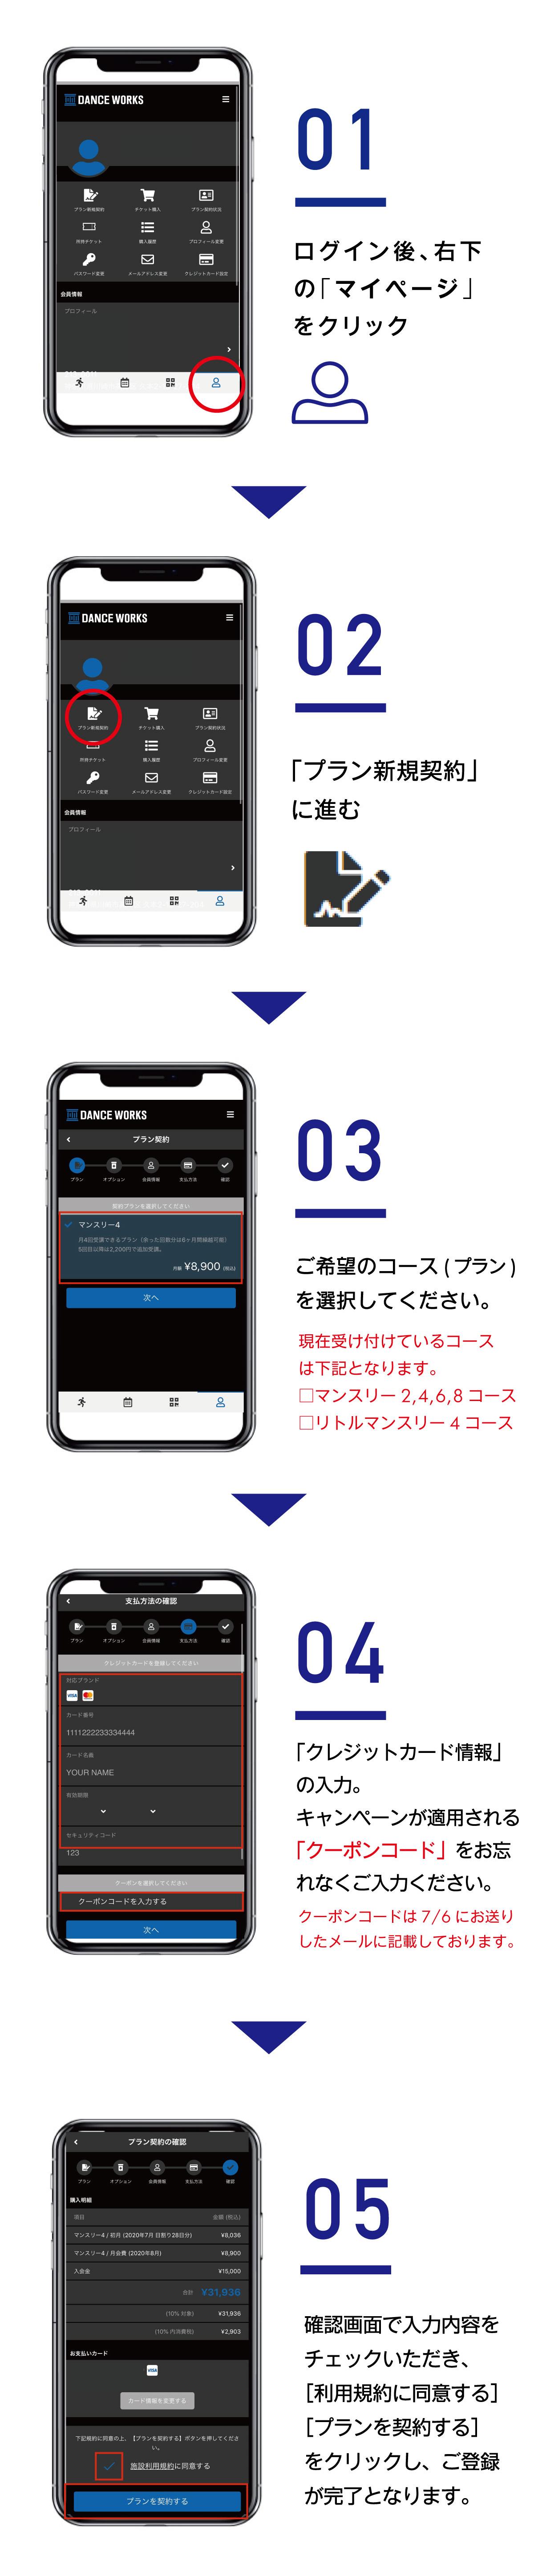 入会手順works (1)